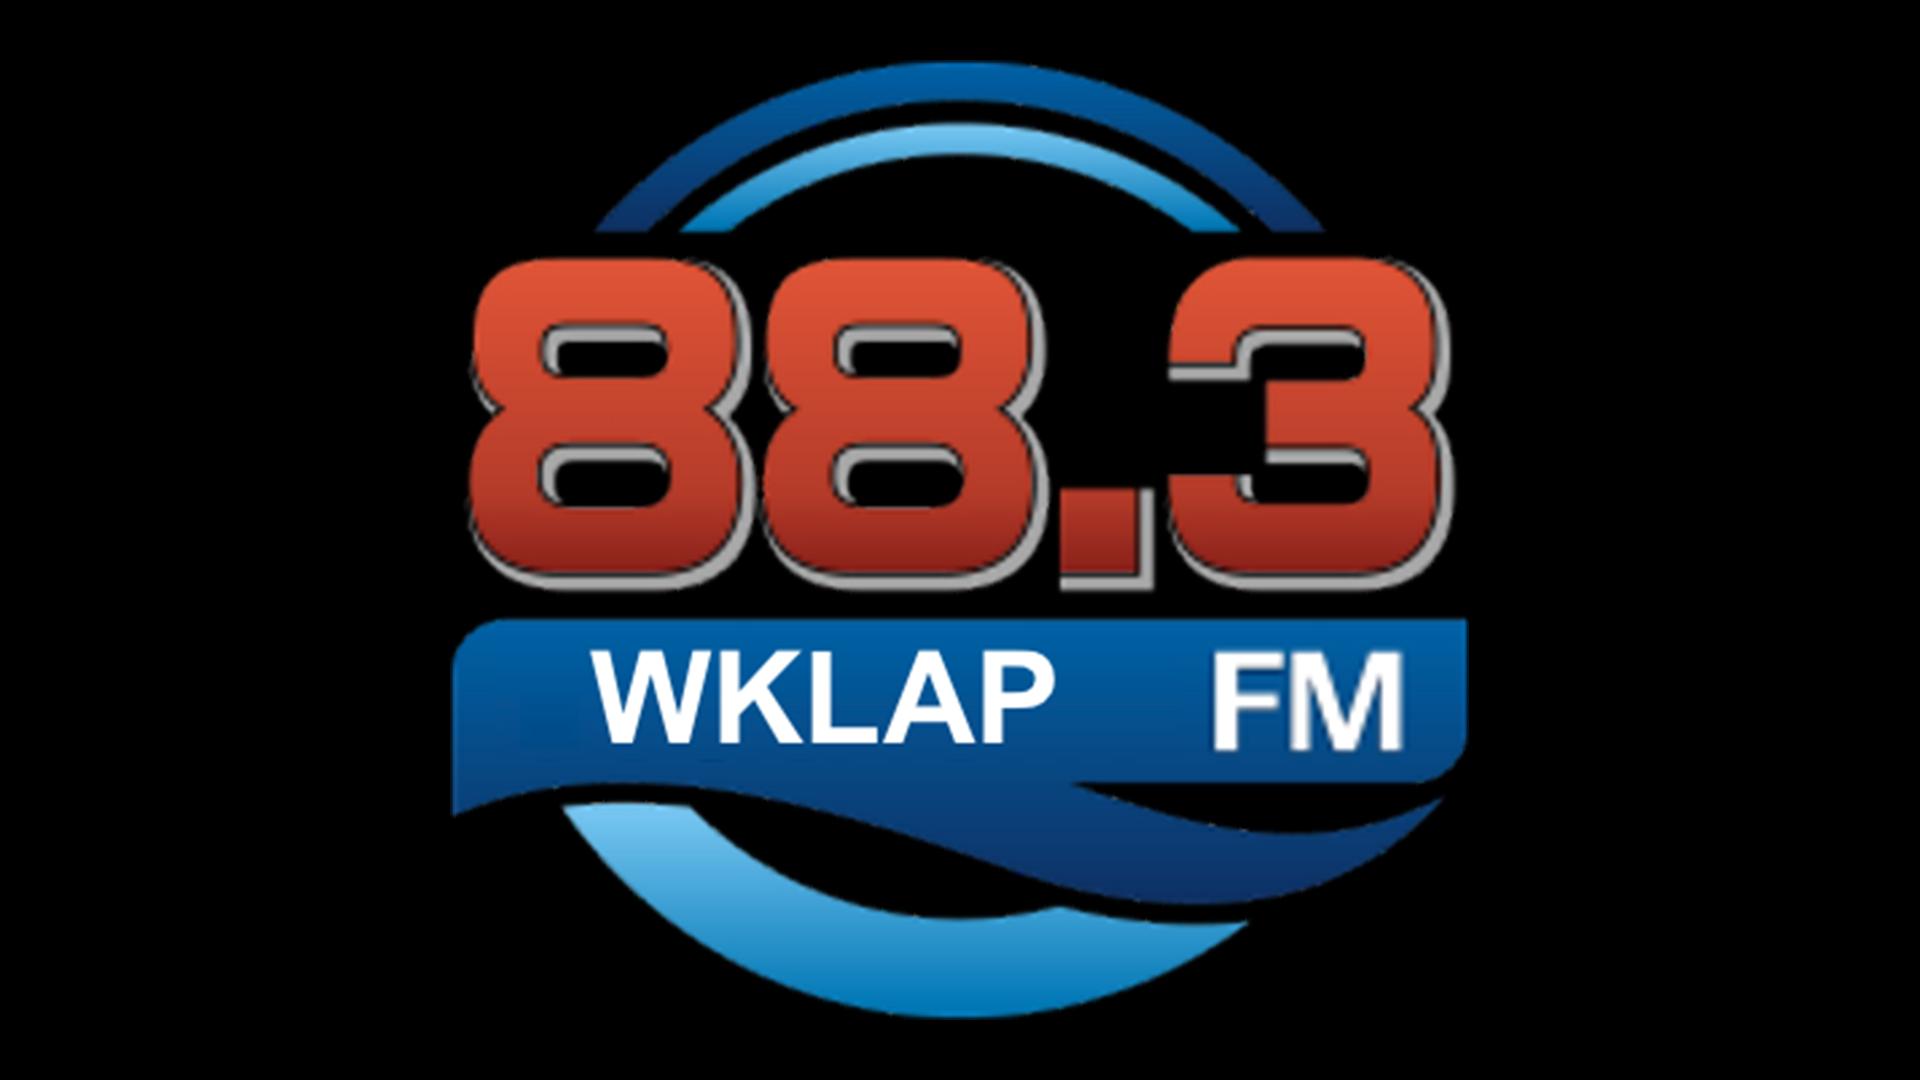 WKLAP 88.3 FM